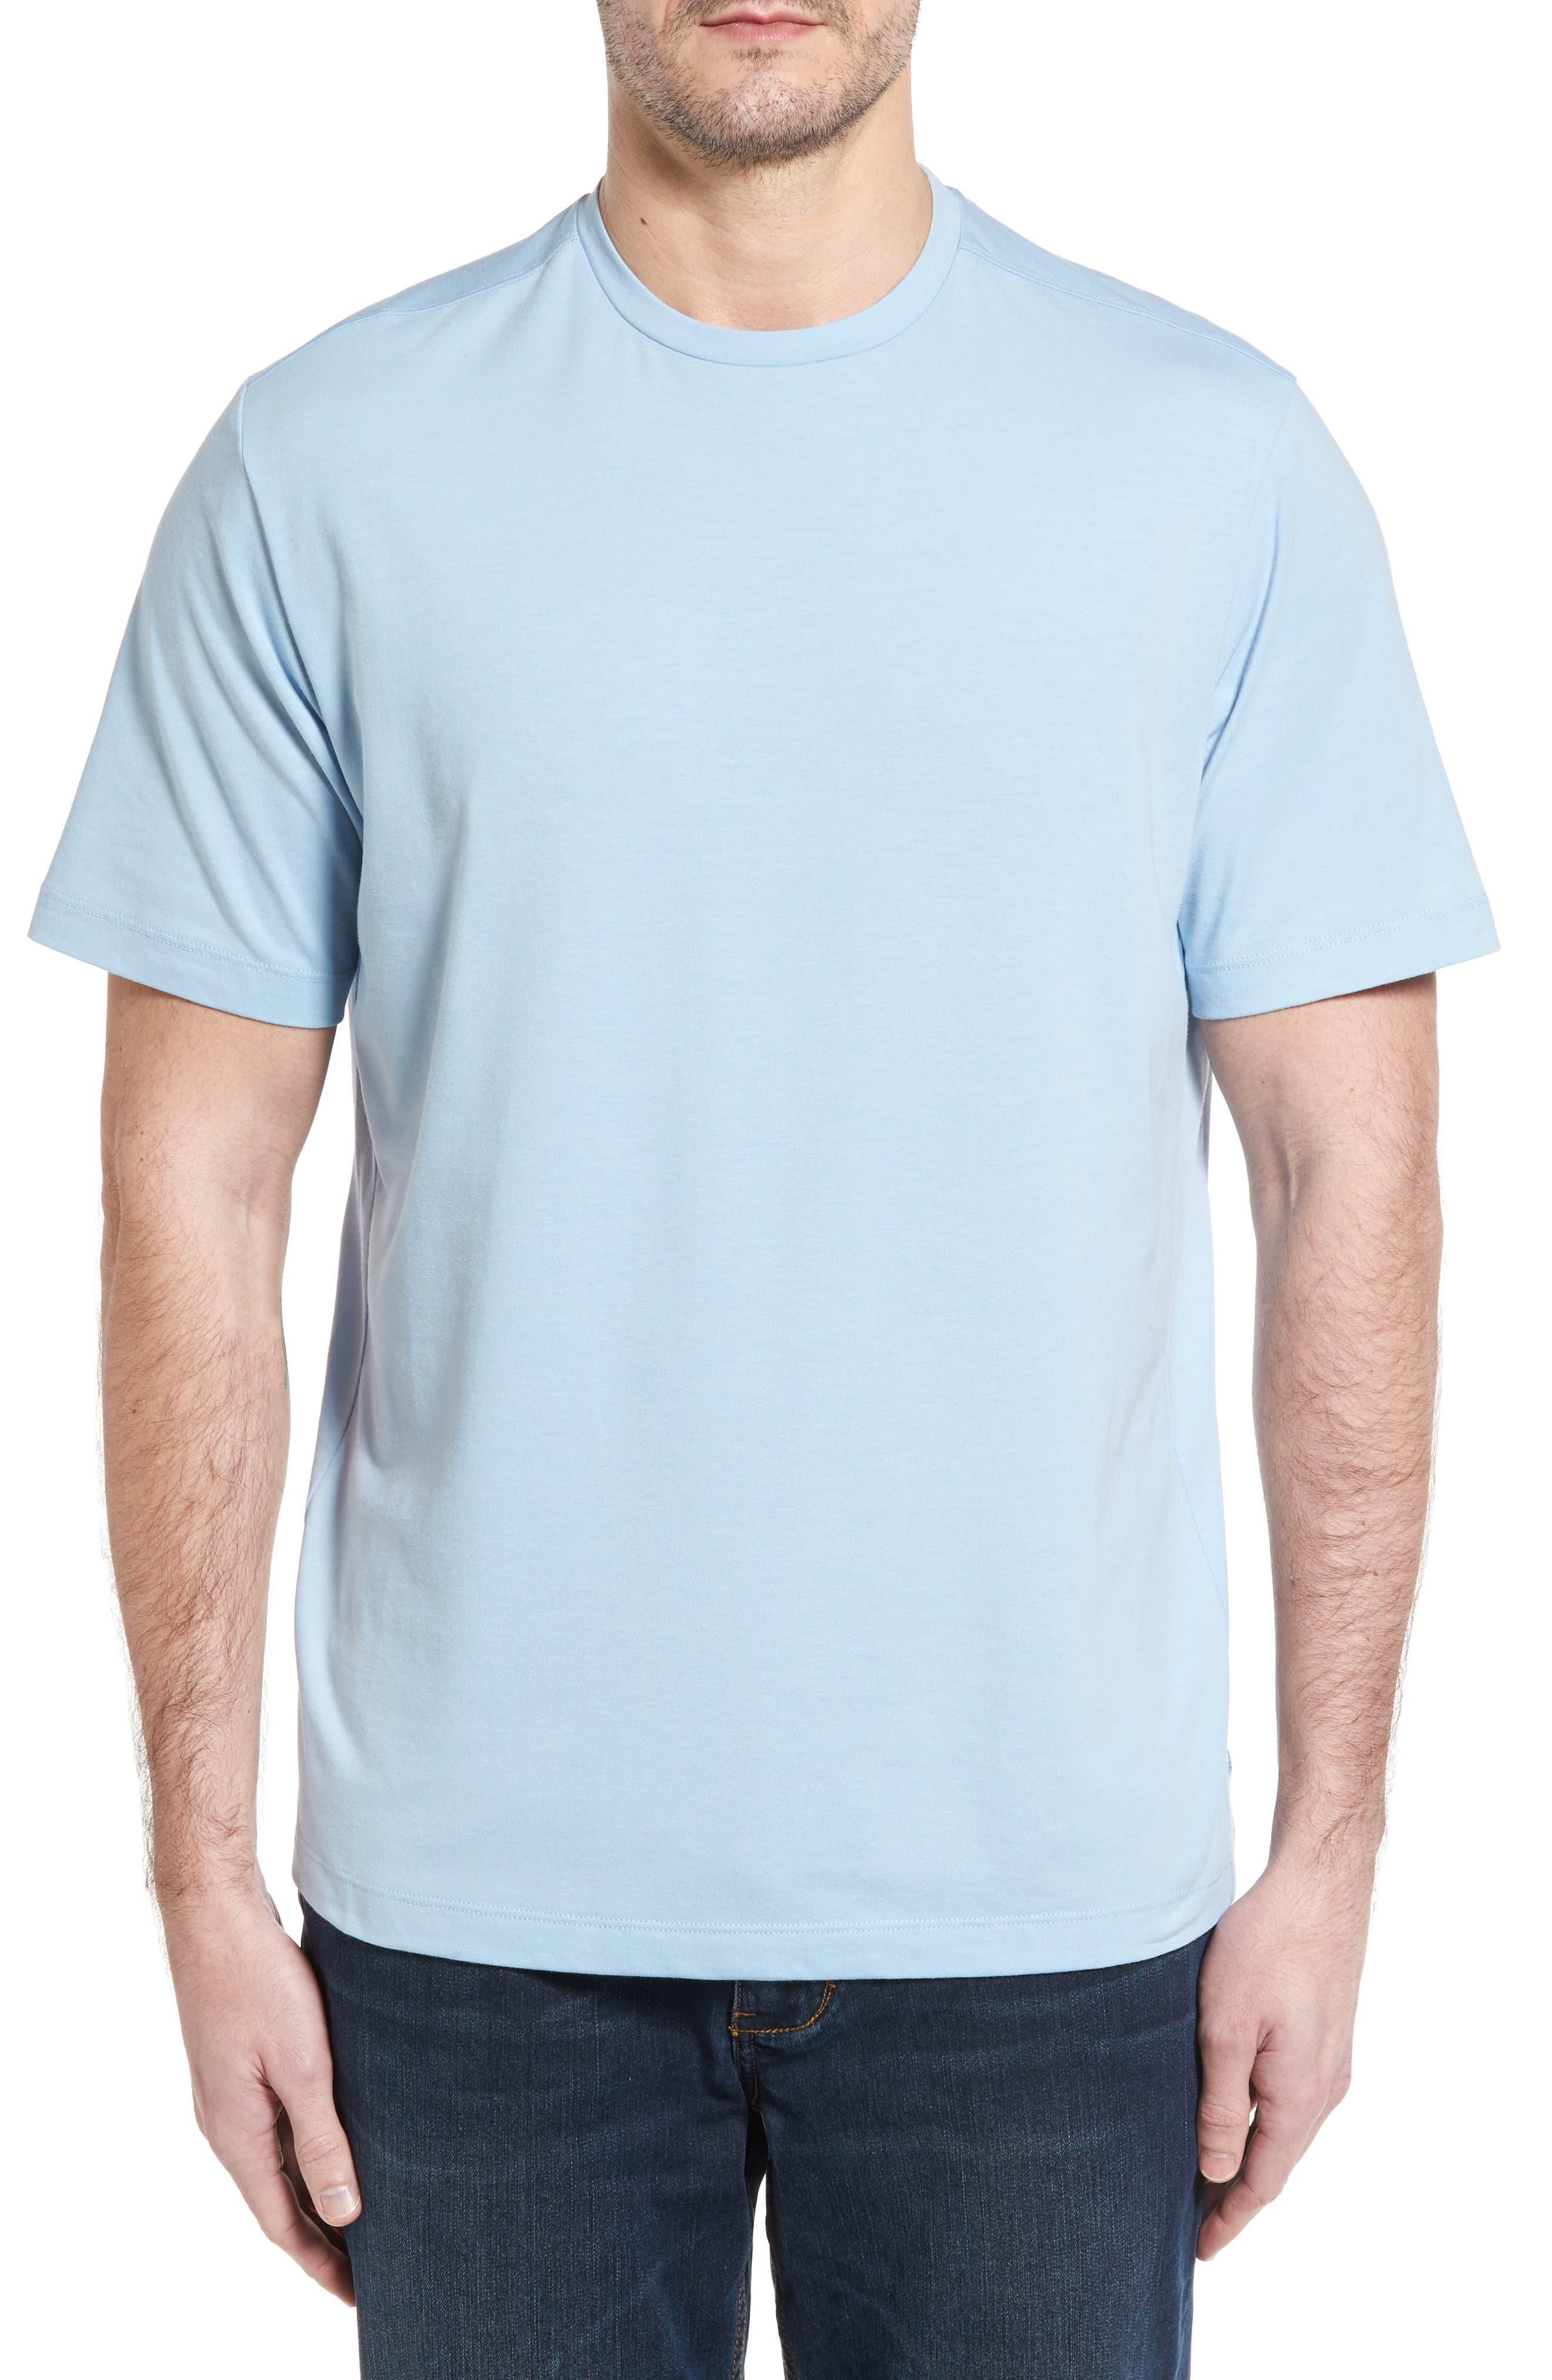 Tropicool T-Shirt,                             Main thumbnail 8, color,